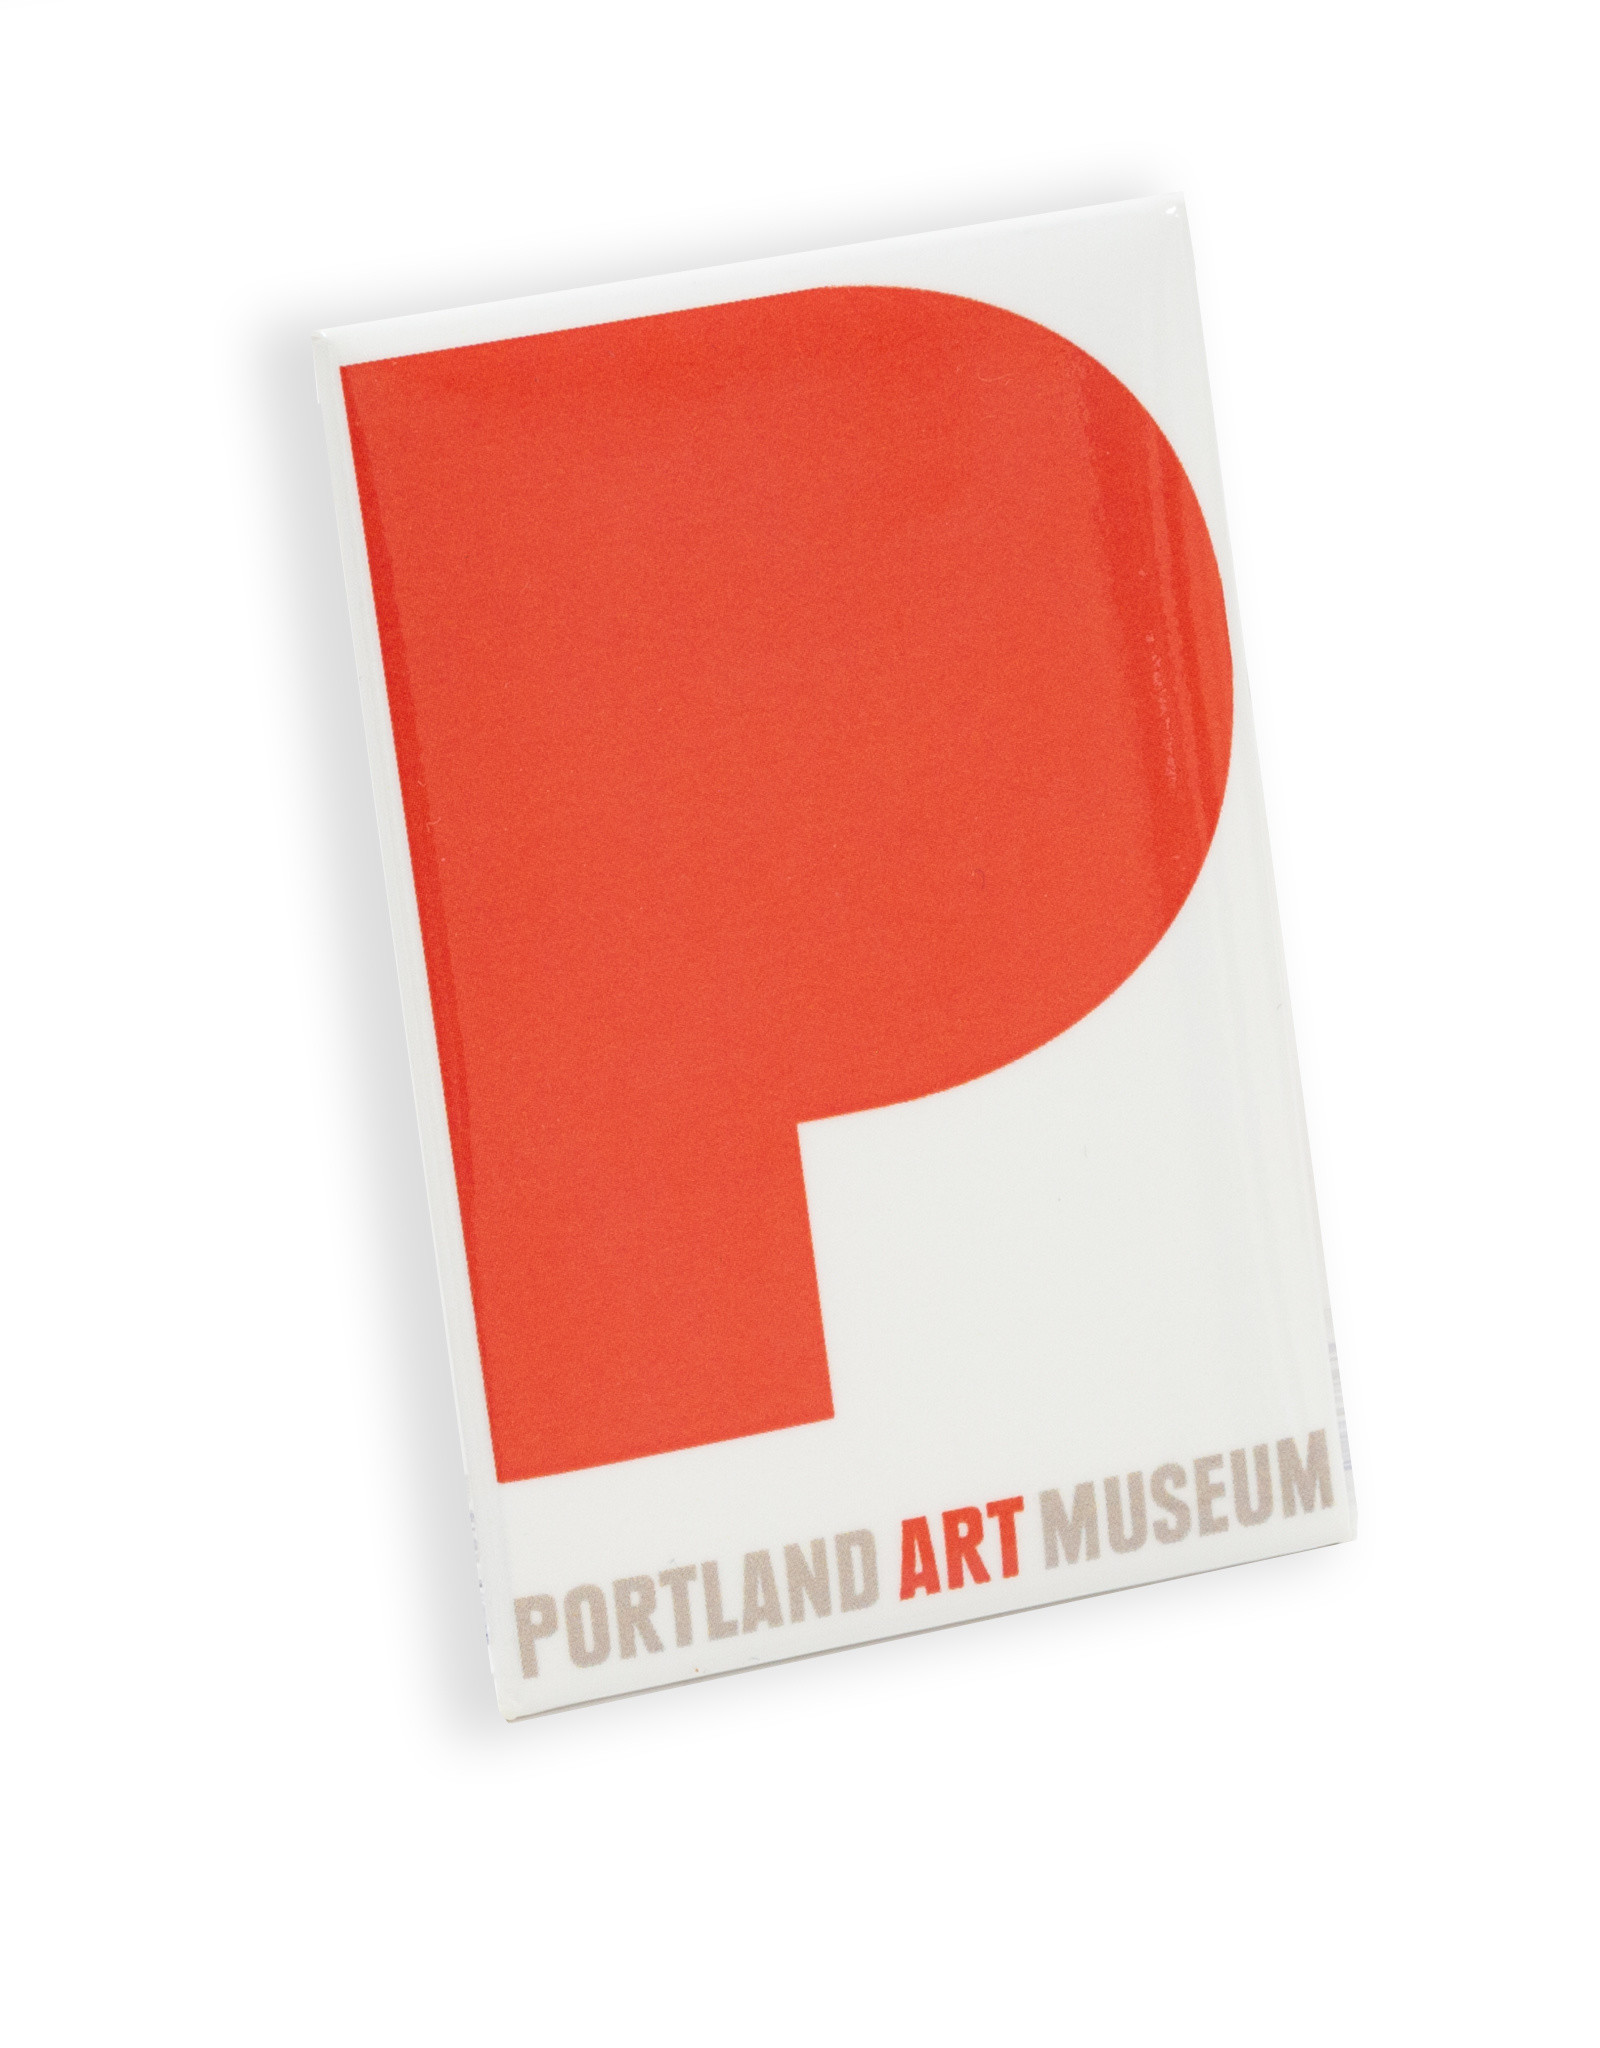 Portland Art Museum Magnet